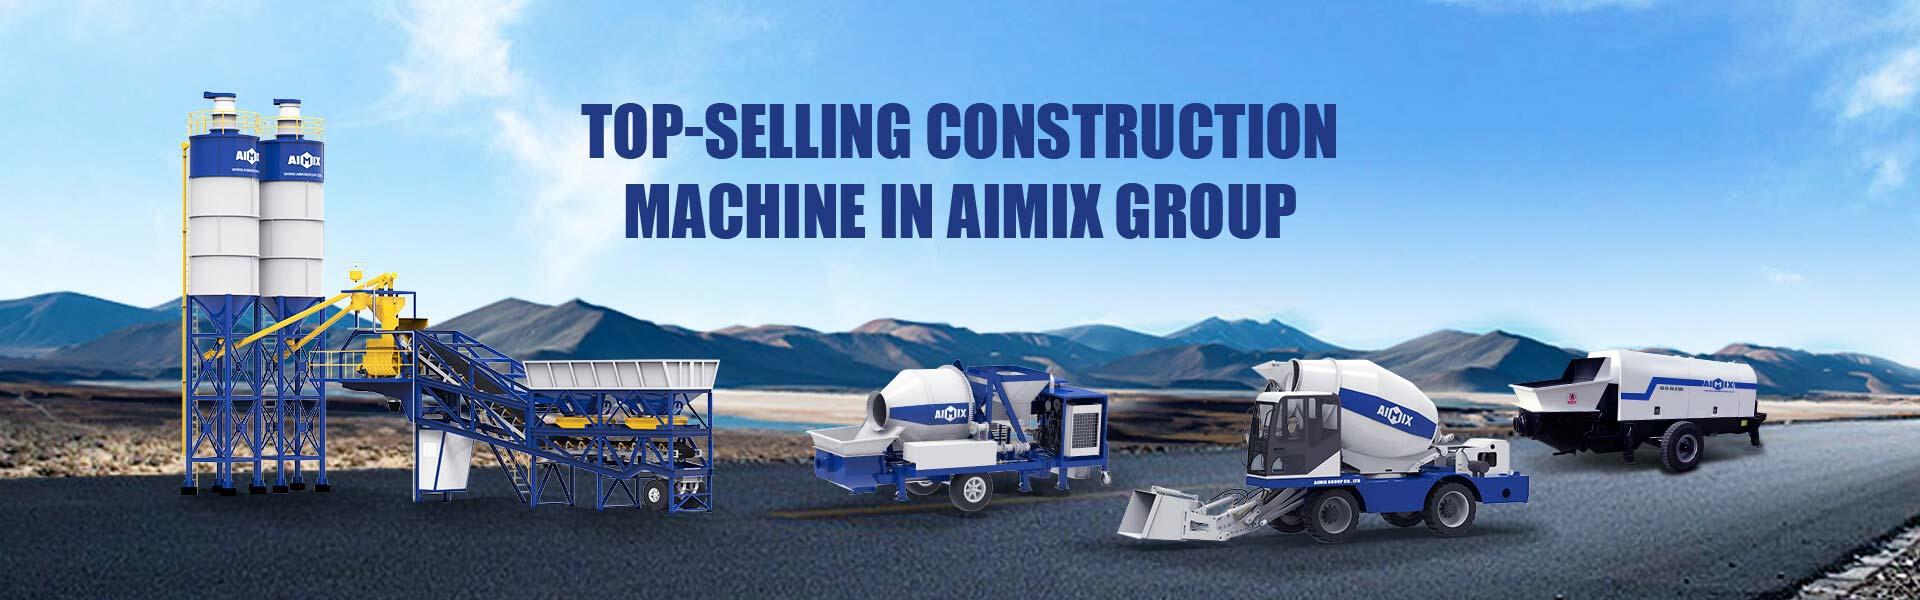 Construction Machine in AIMIX